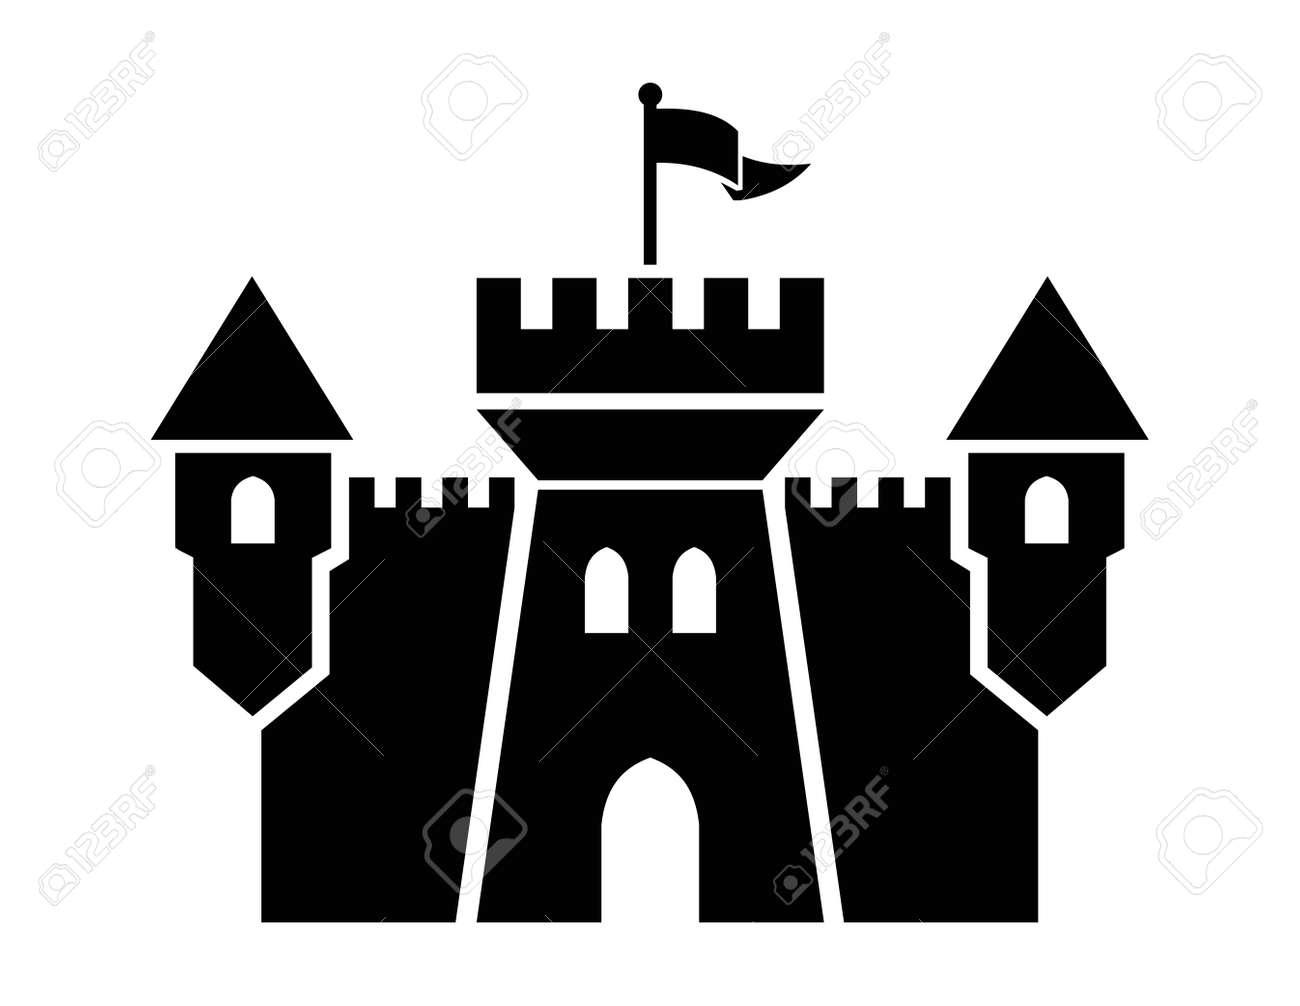 Clip Art Castle Images & Stock Pictures. Royalty Free Clip Art ...